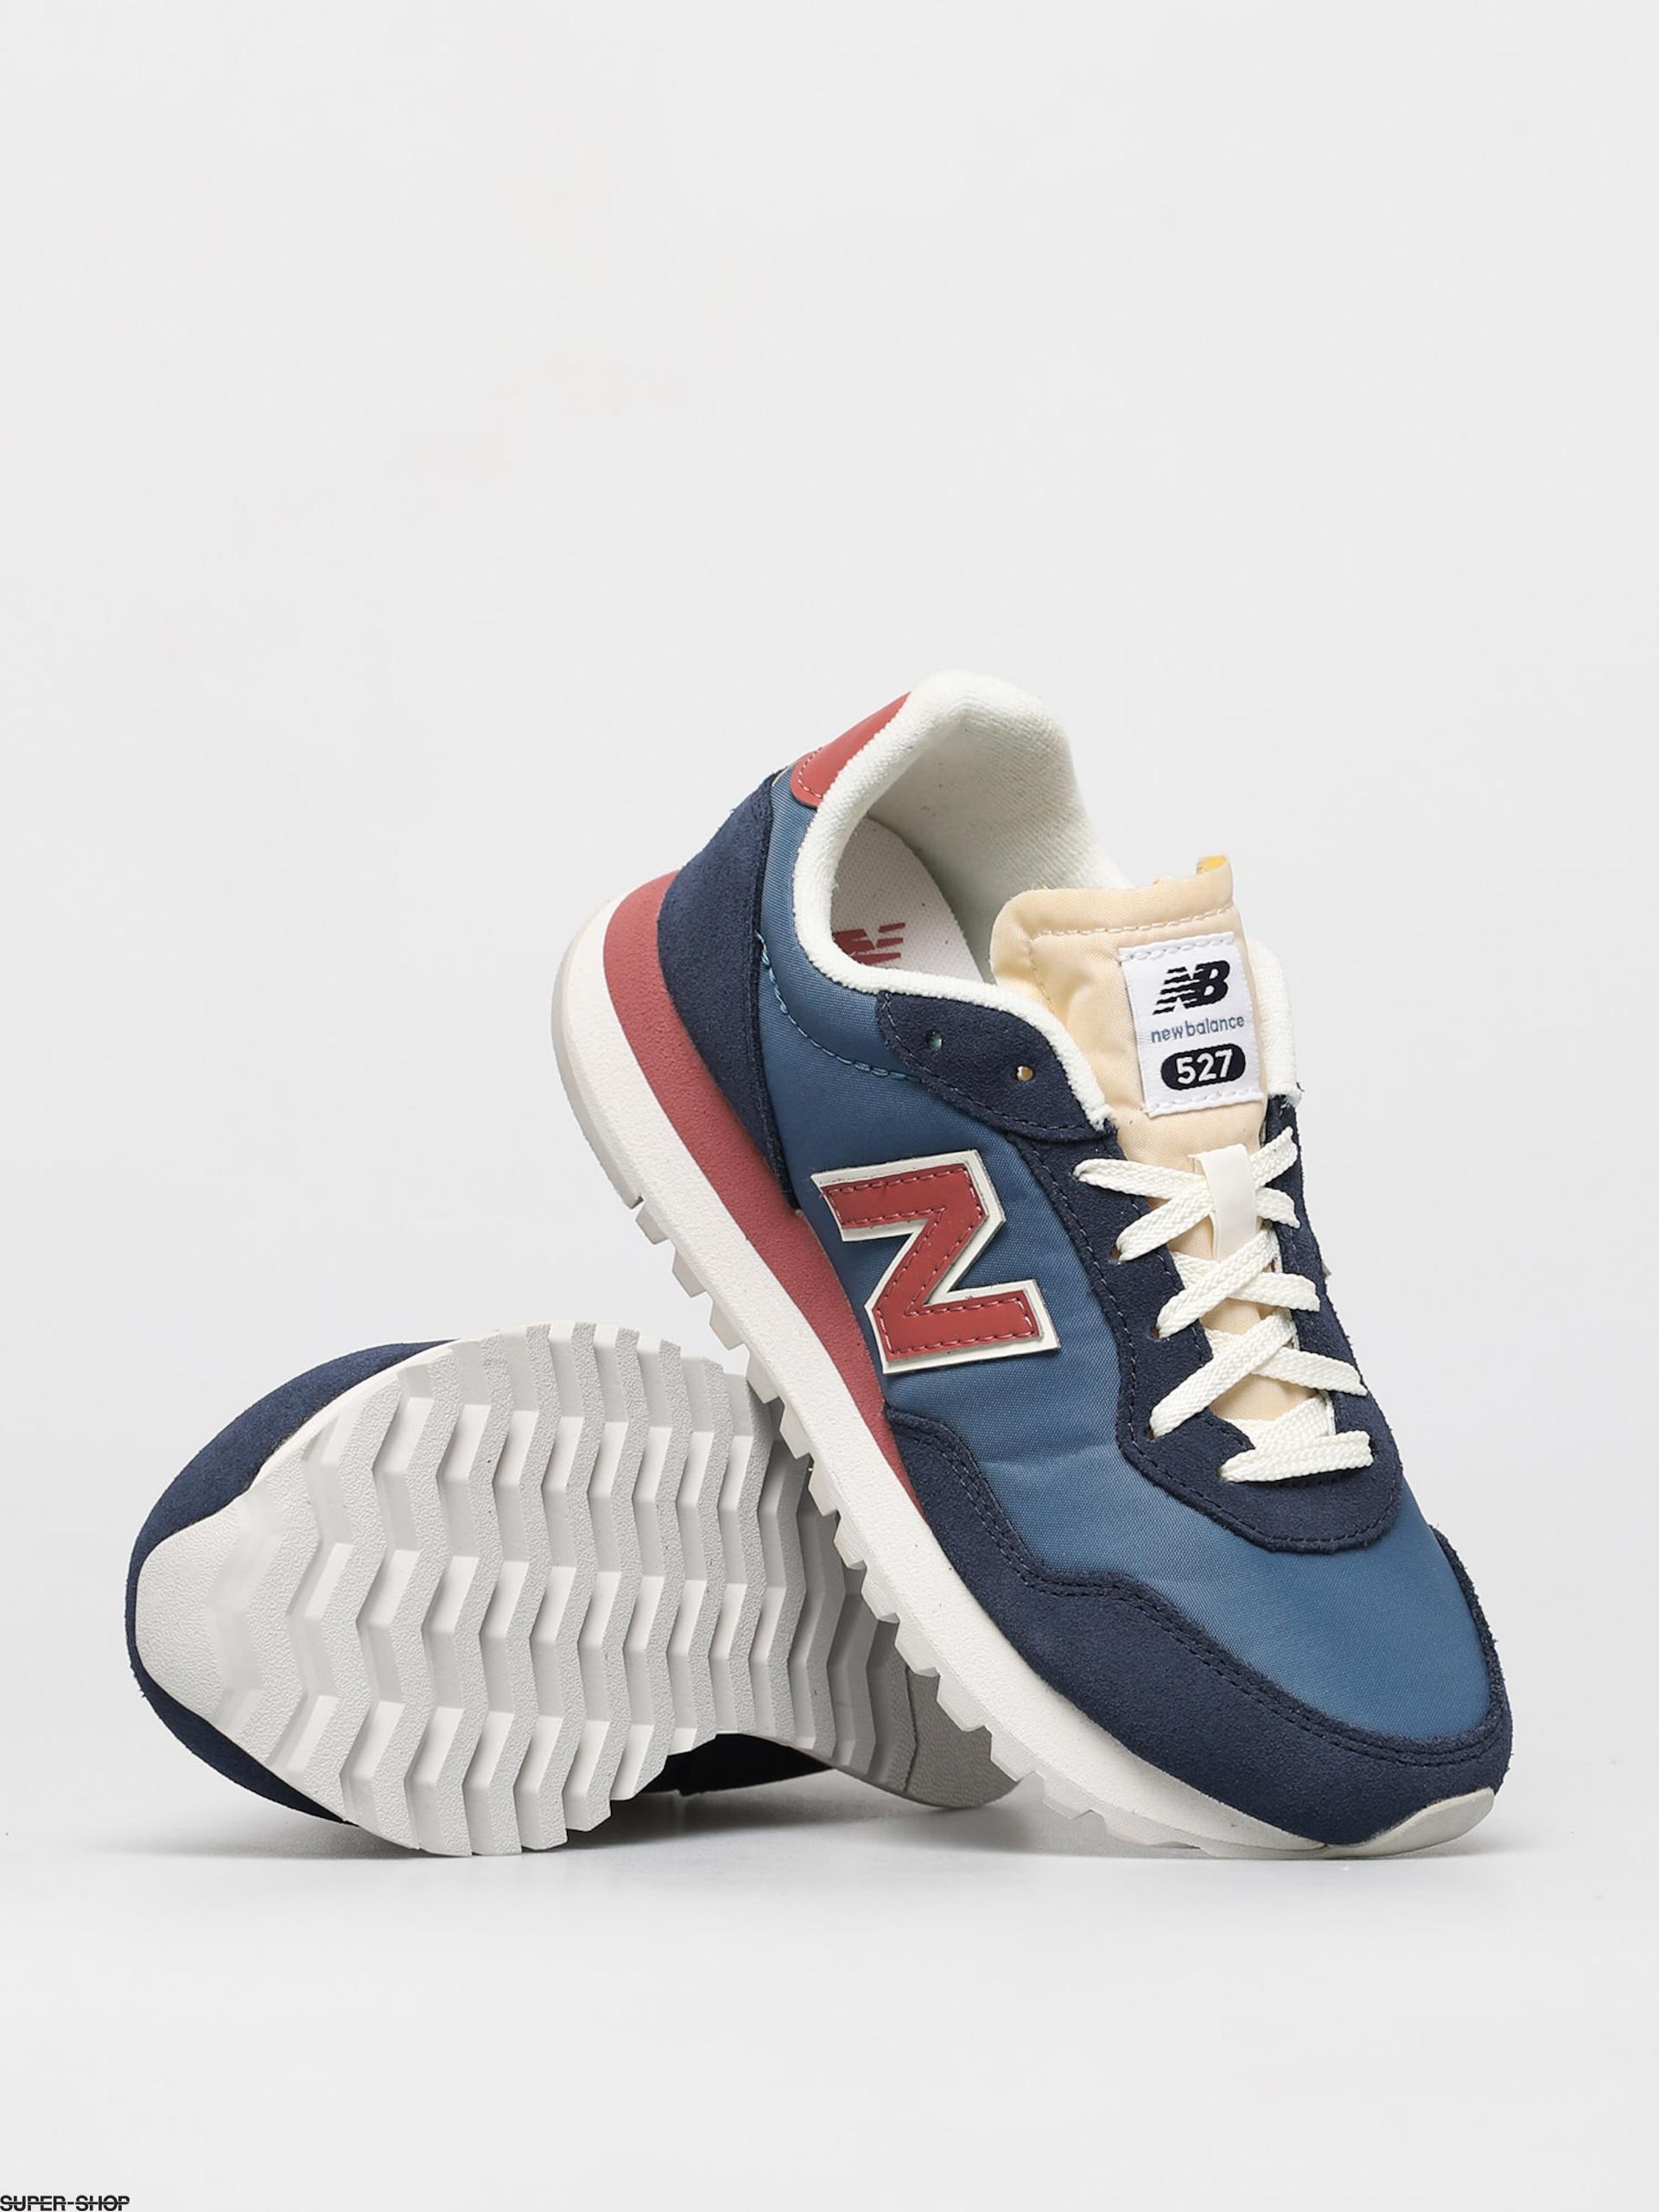 new balance 527